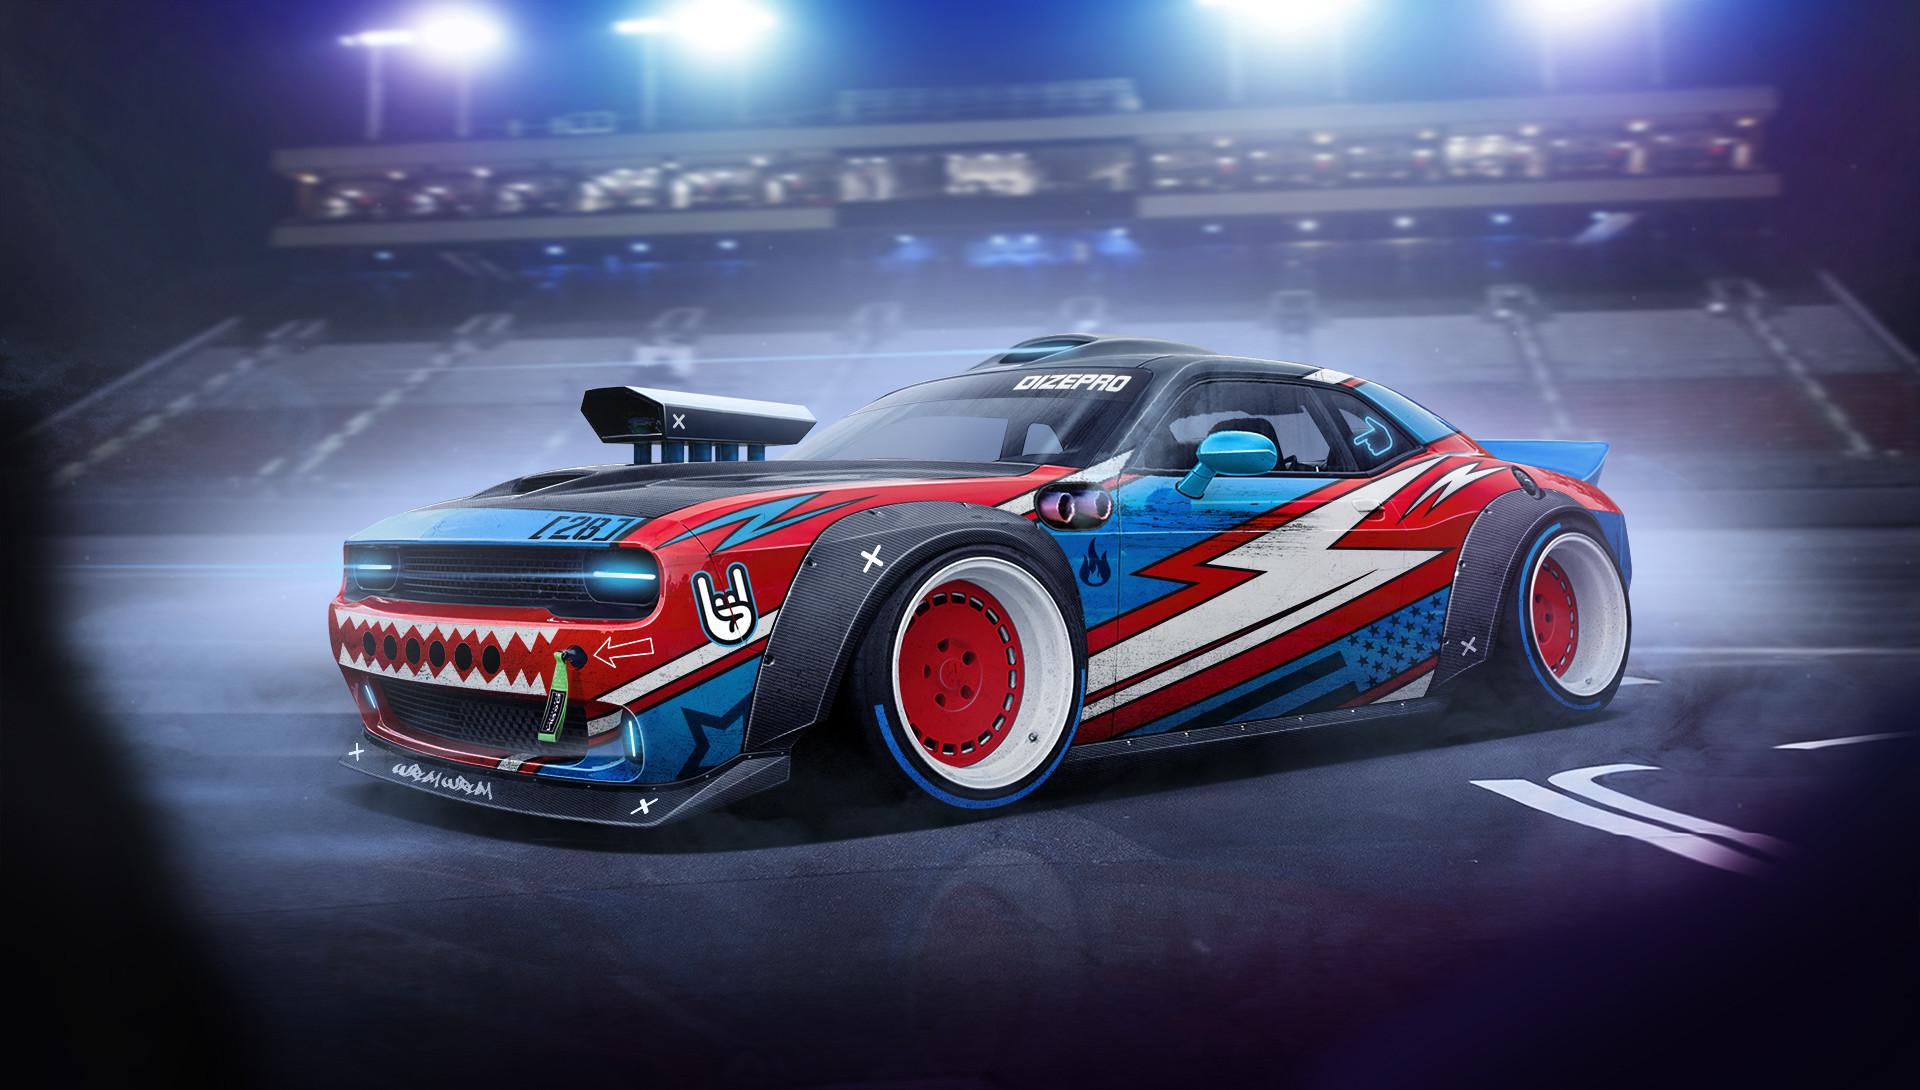 Amazing Drift Car Artwork Hd Artist 4k Wallpapers Images